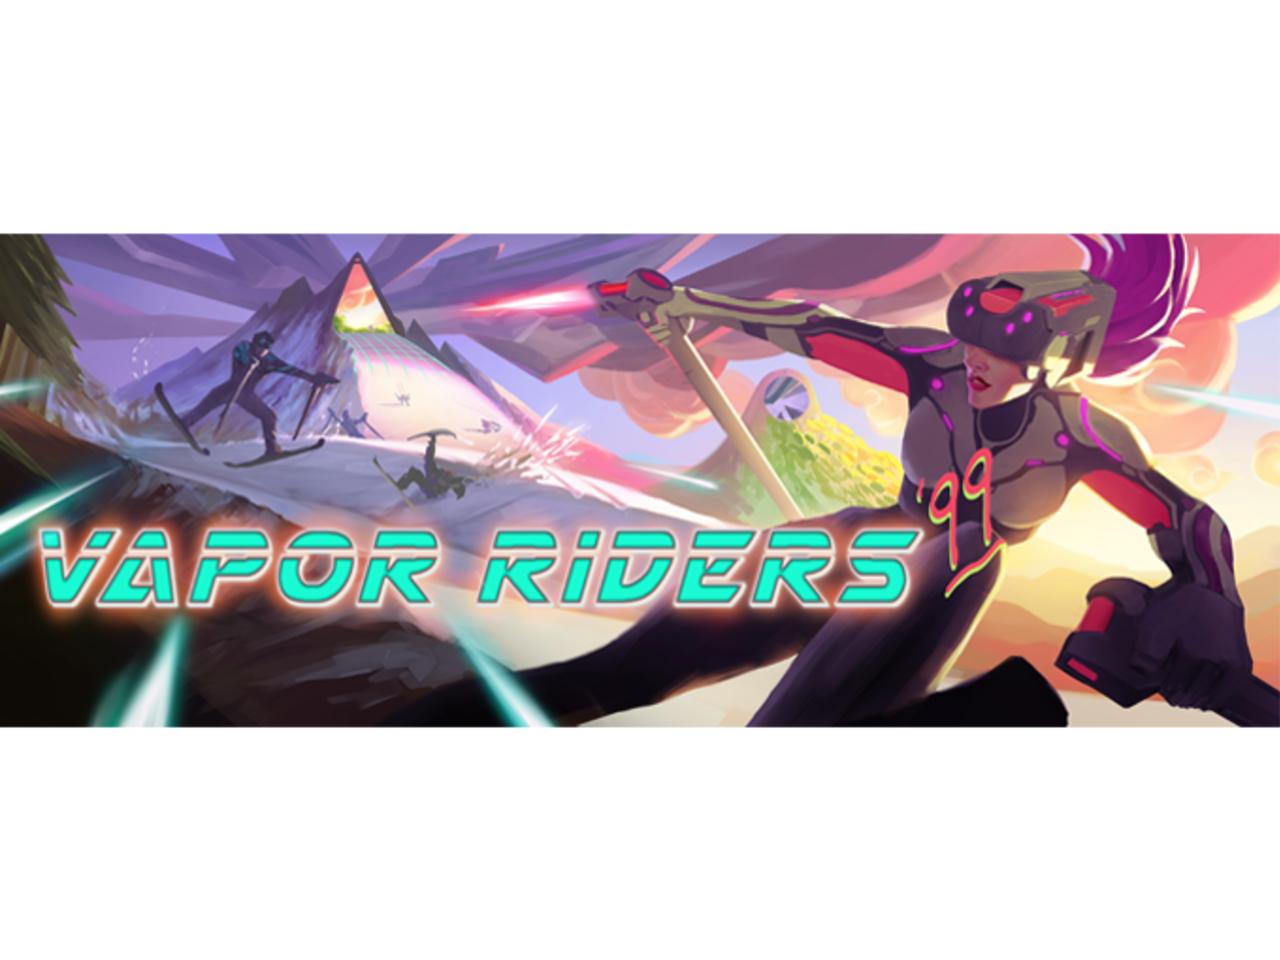 Vapor Riders '99